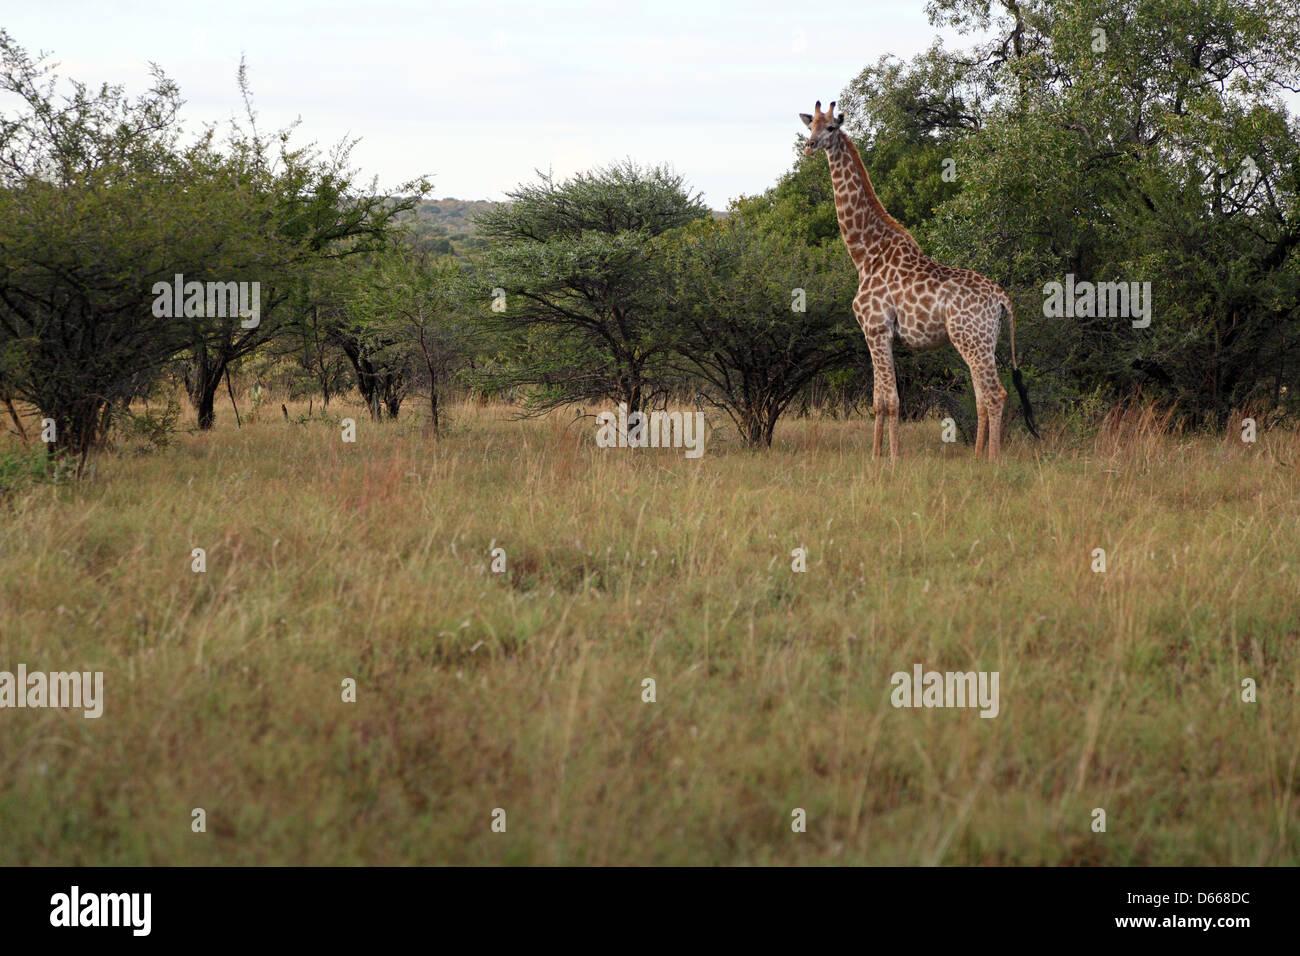 African Giraffe - Stock Image